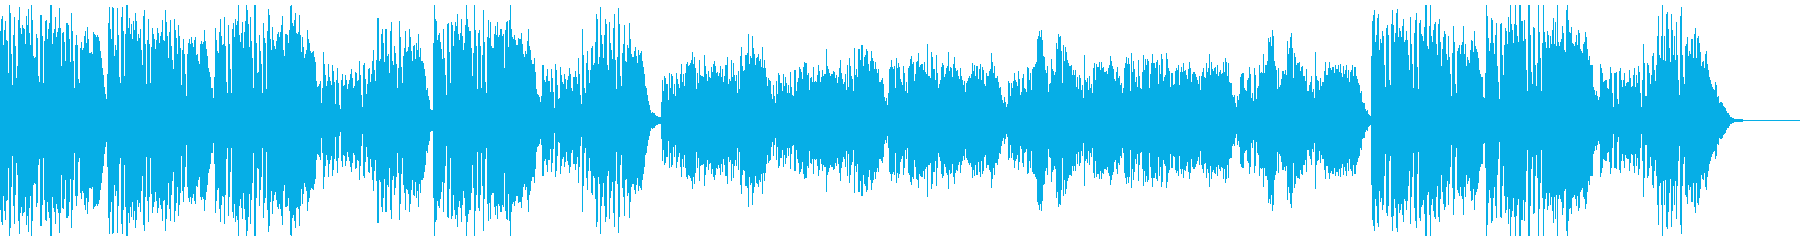 BWV1067/5『ポロネーズ』バッハの再生済みの波形